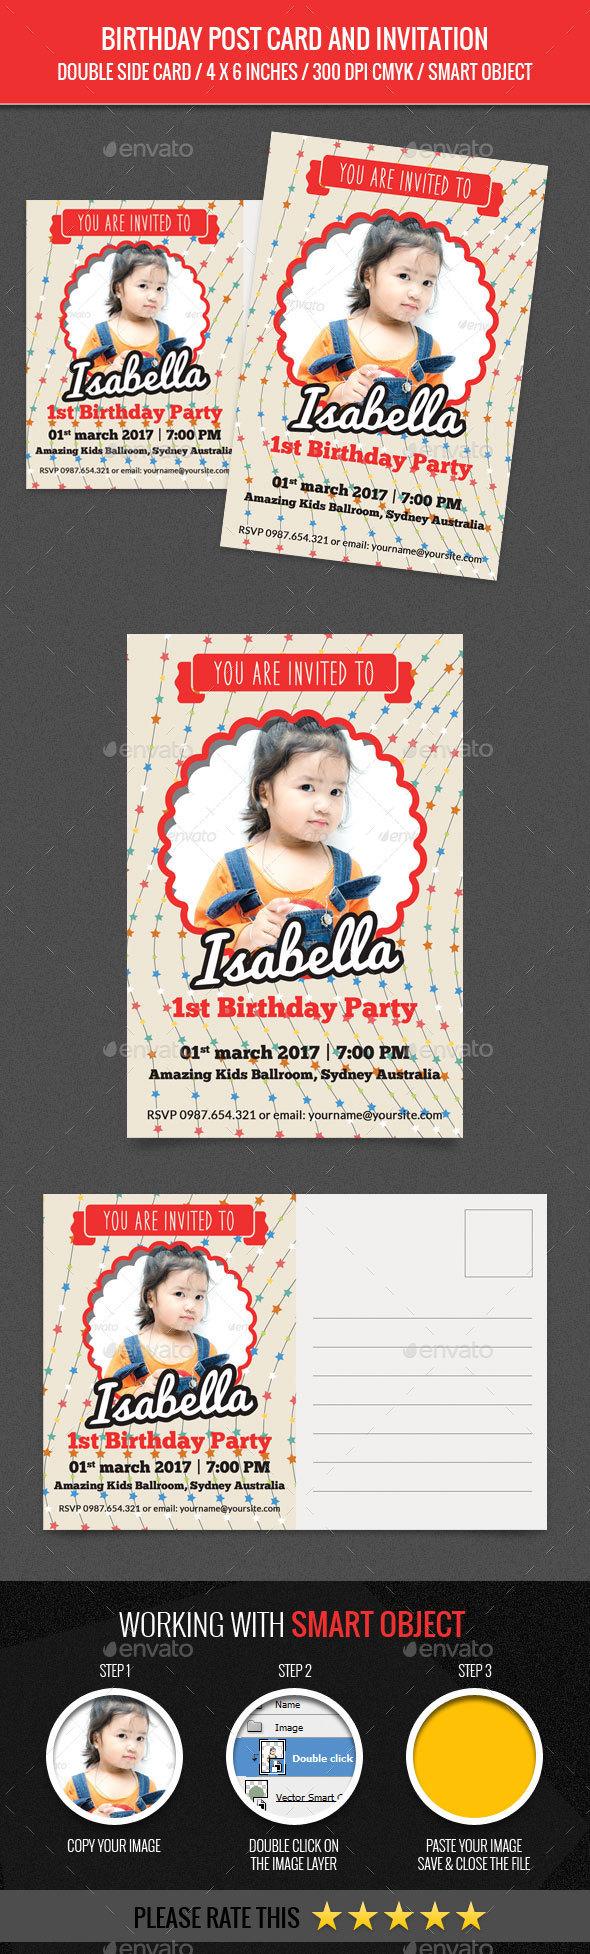 Birthday Post Card and Invitation Card - Birthday Greeting Cards